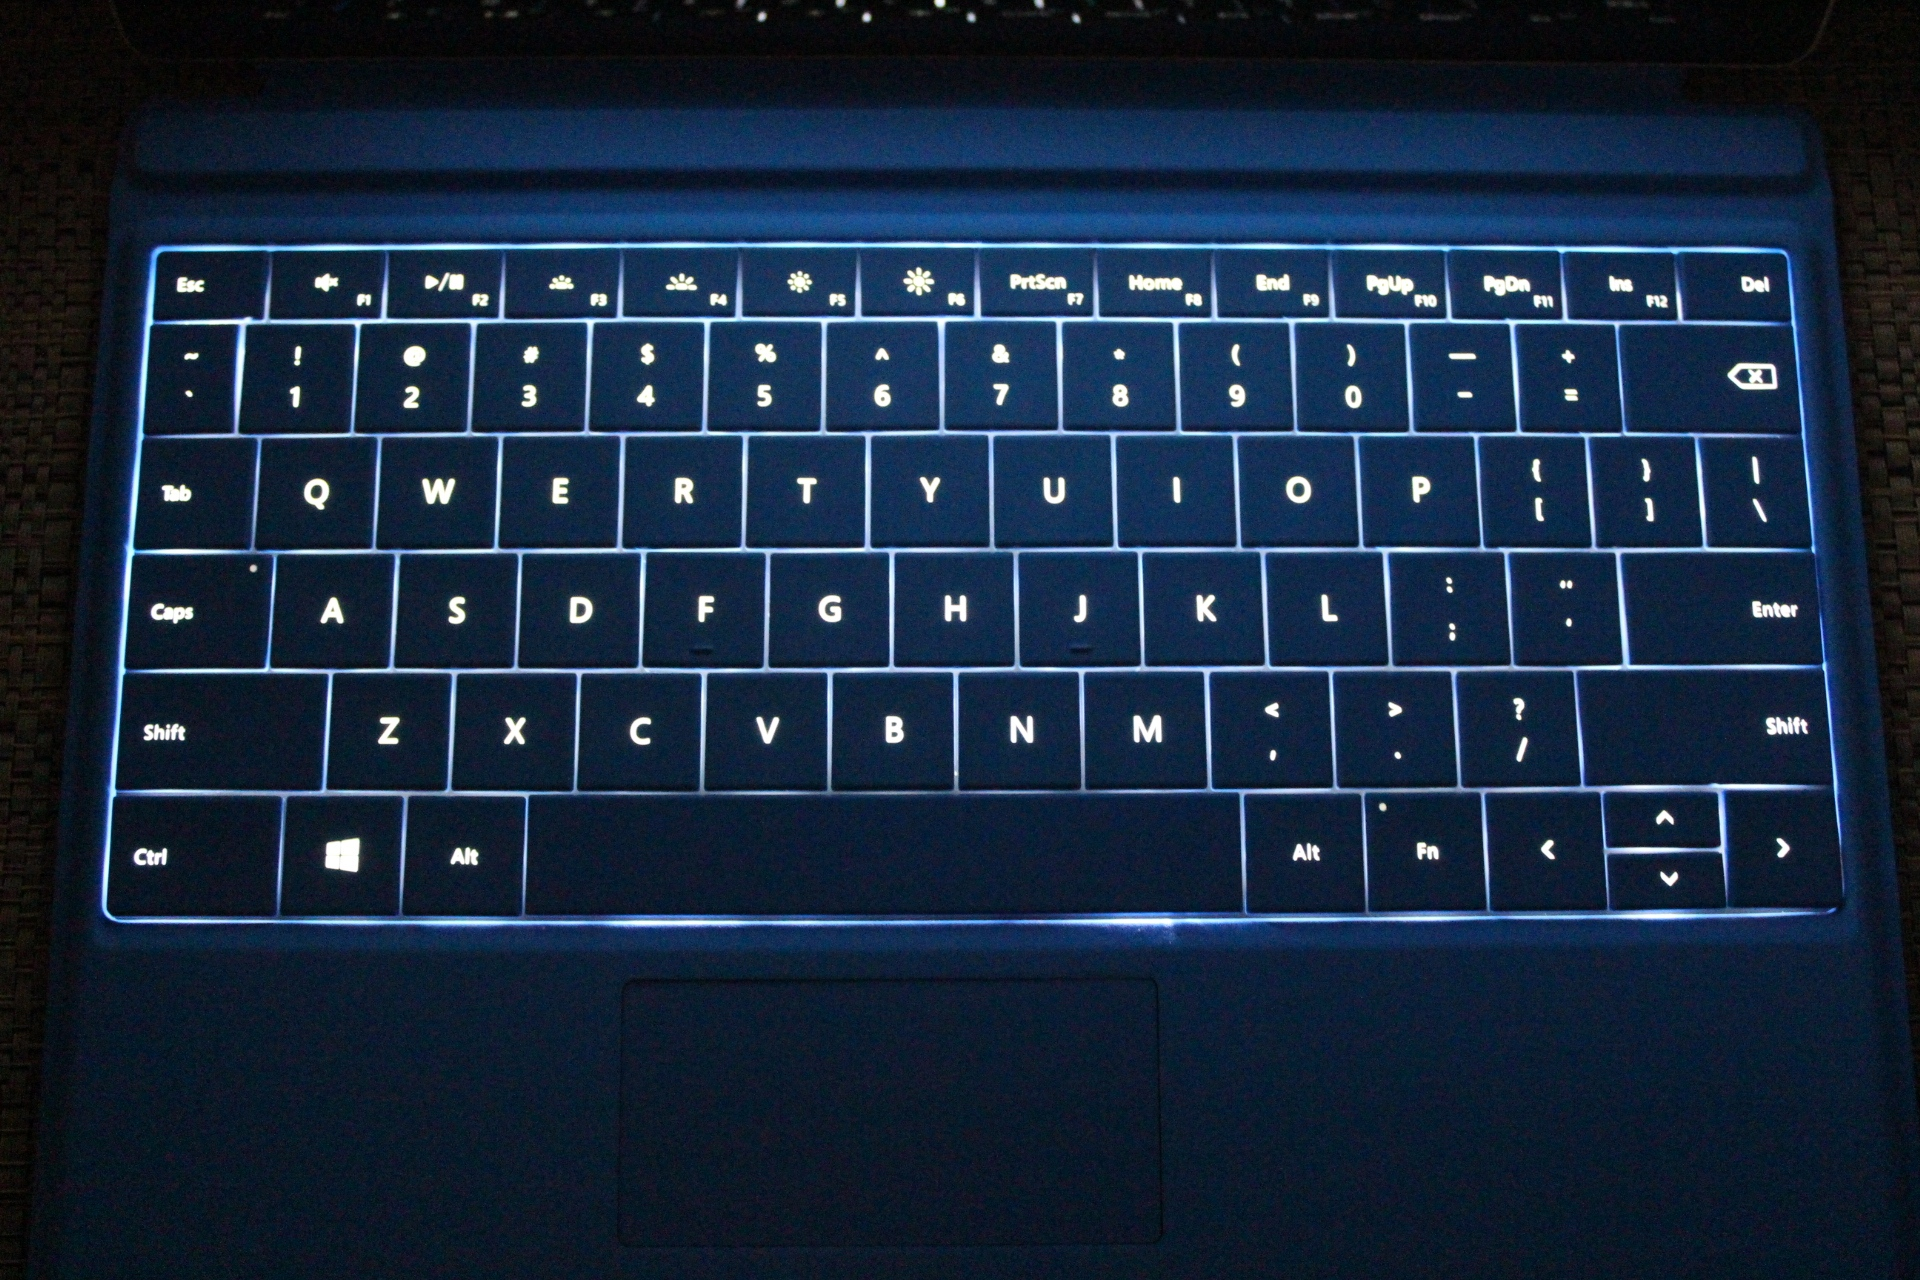 Surface 3 Keyboard Not Working